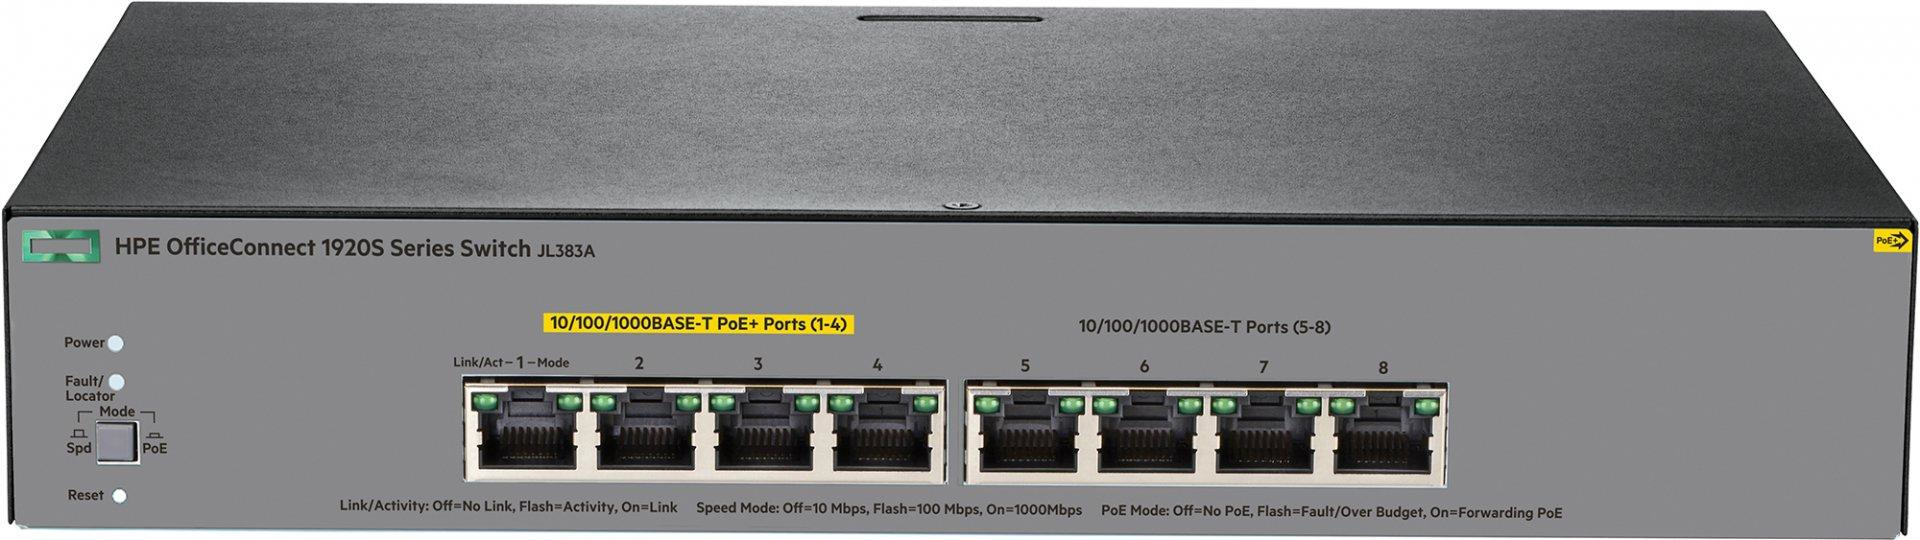 Hewlett Packard Enterprise OfficeConnect 1920S 8G PPoE+ 65W Managed L3  Gigabit Ethernet (10/100/1000) Grey 1U Power over Ethernet (PoE)